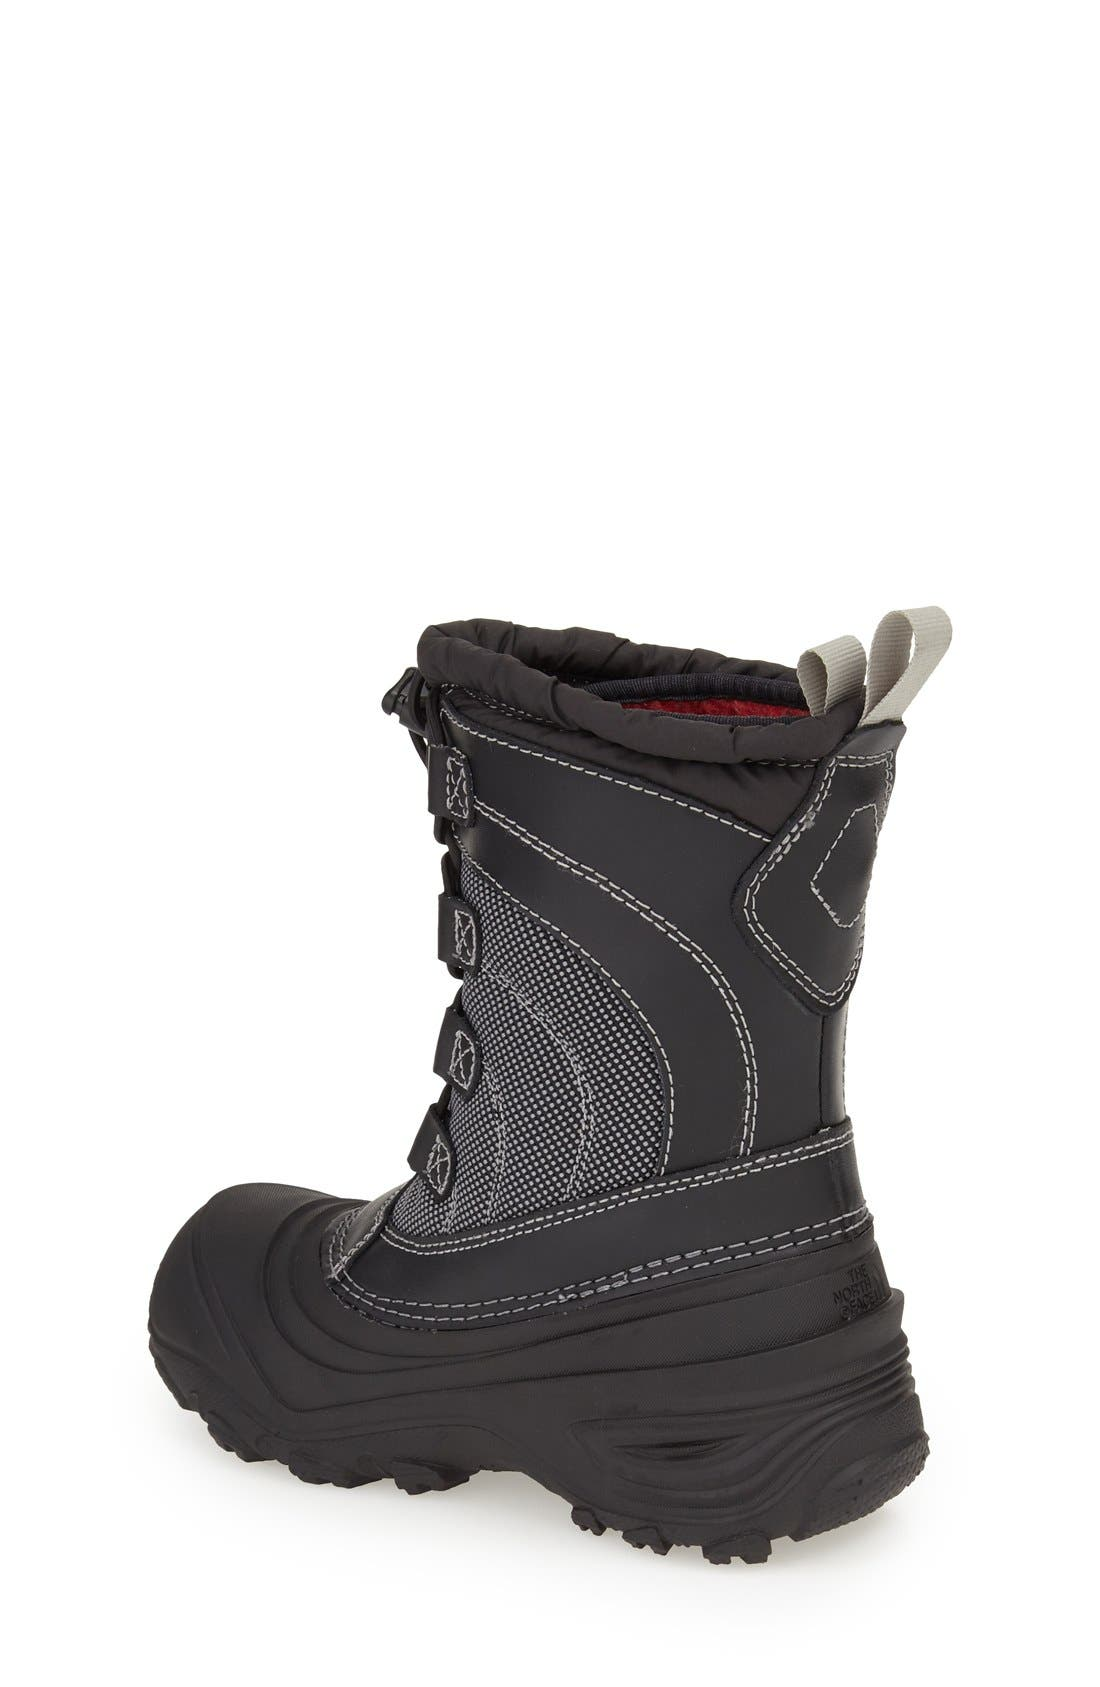 'Alpenglow IV' Bungee Lace Waterproof Boot,                             Alternate thumbnail 2, color,                             BLACK/ BLACK